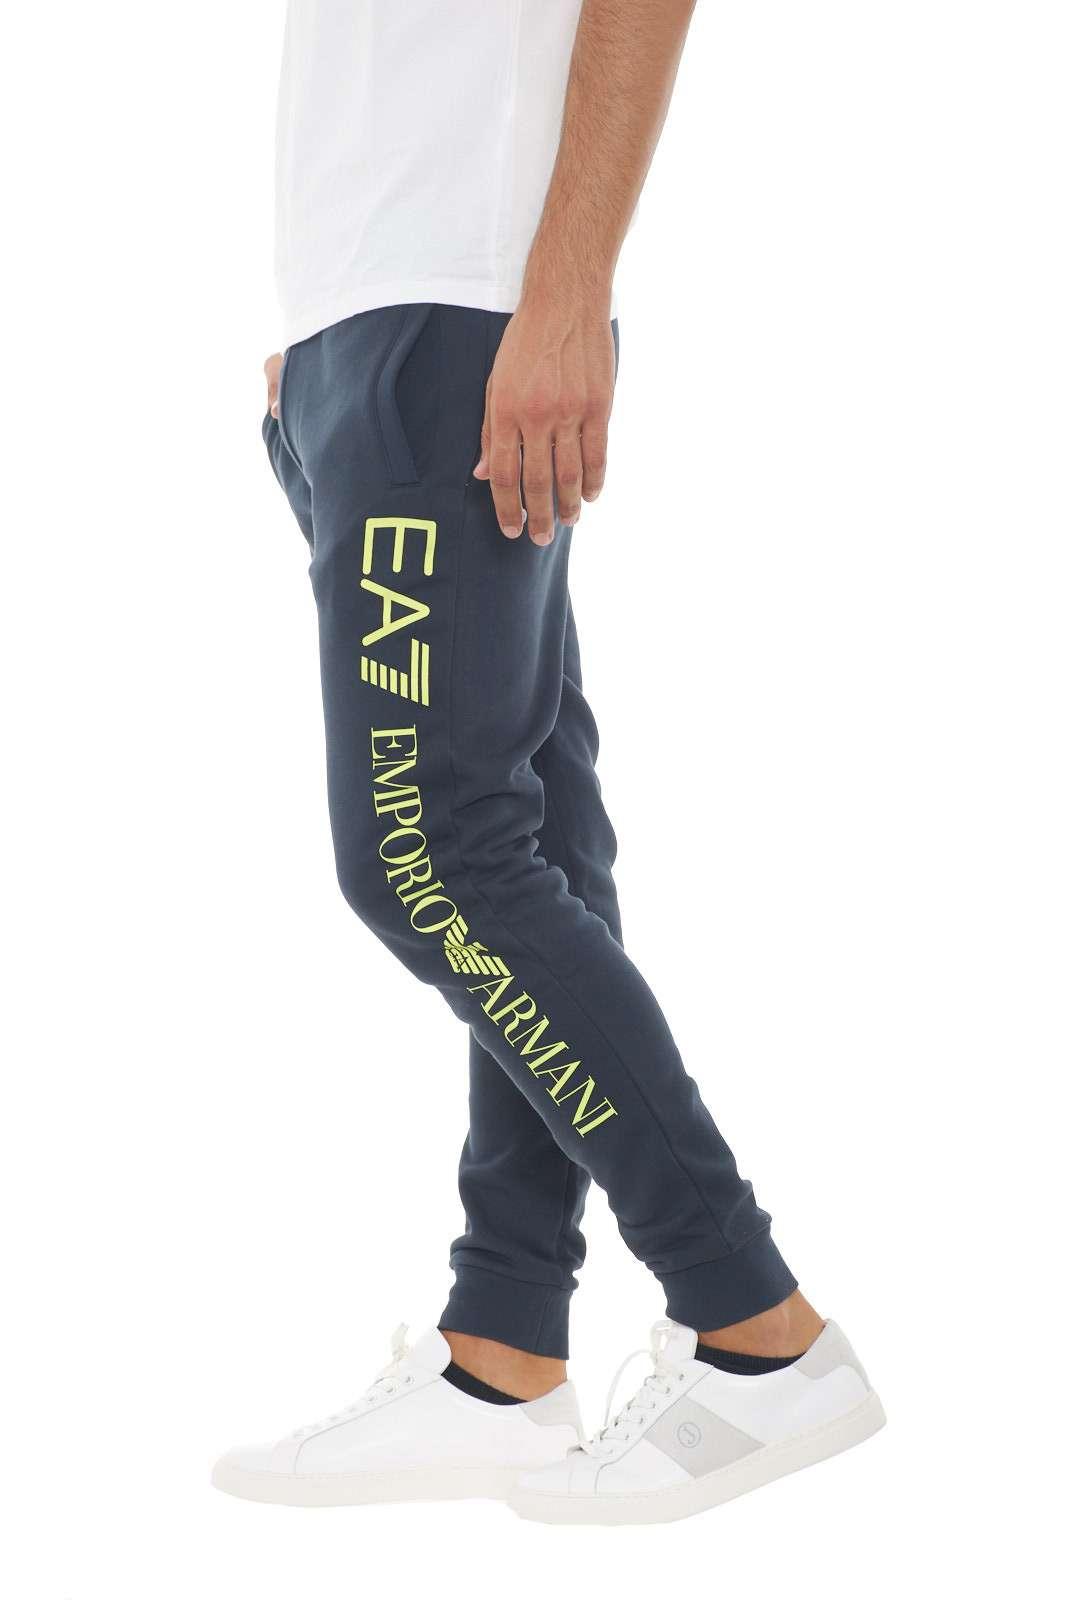 https://www.parmax.com/media/catalog/product/a/i/AI-outlet_parmax-pantaloni-uomo-Emporio-Armani-8NPPB5-B.jpg